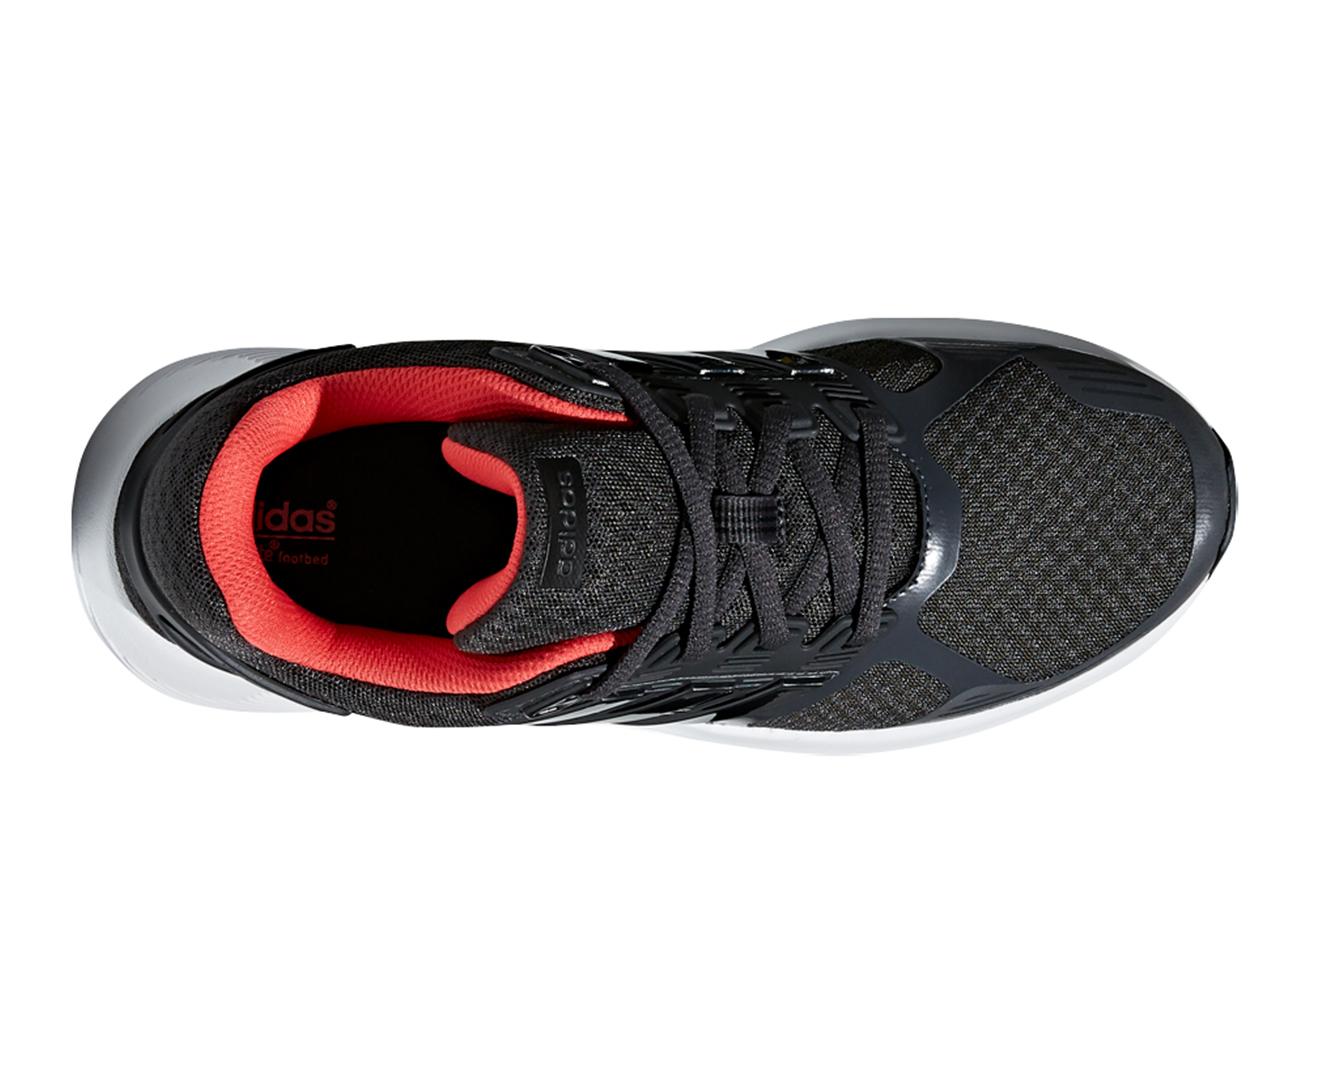 Zapatillas mujer Adidas Coral Duramo 8 para/ mujer Carbon/ Coral | 1e9db5d - burpimmunitet.website